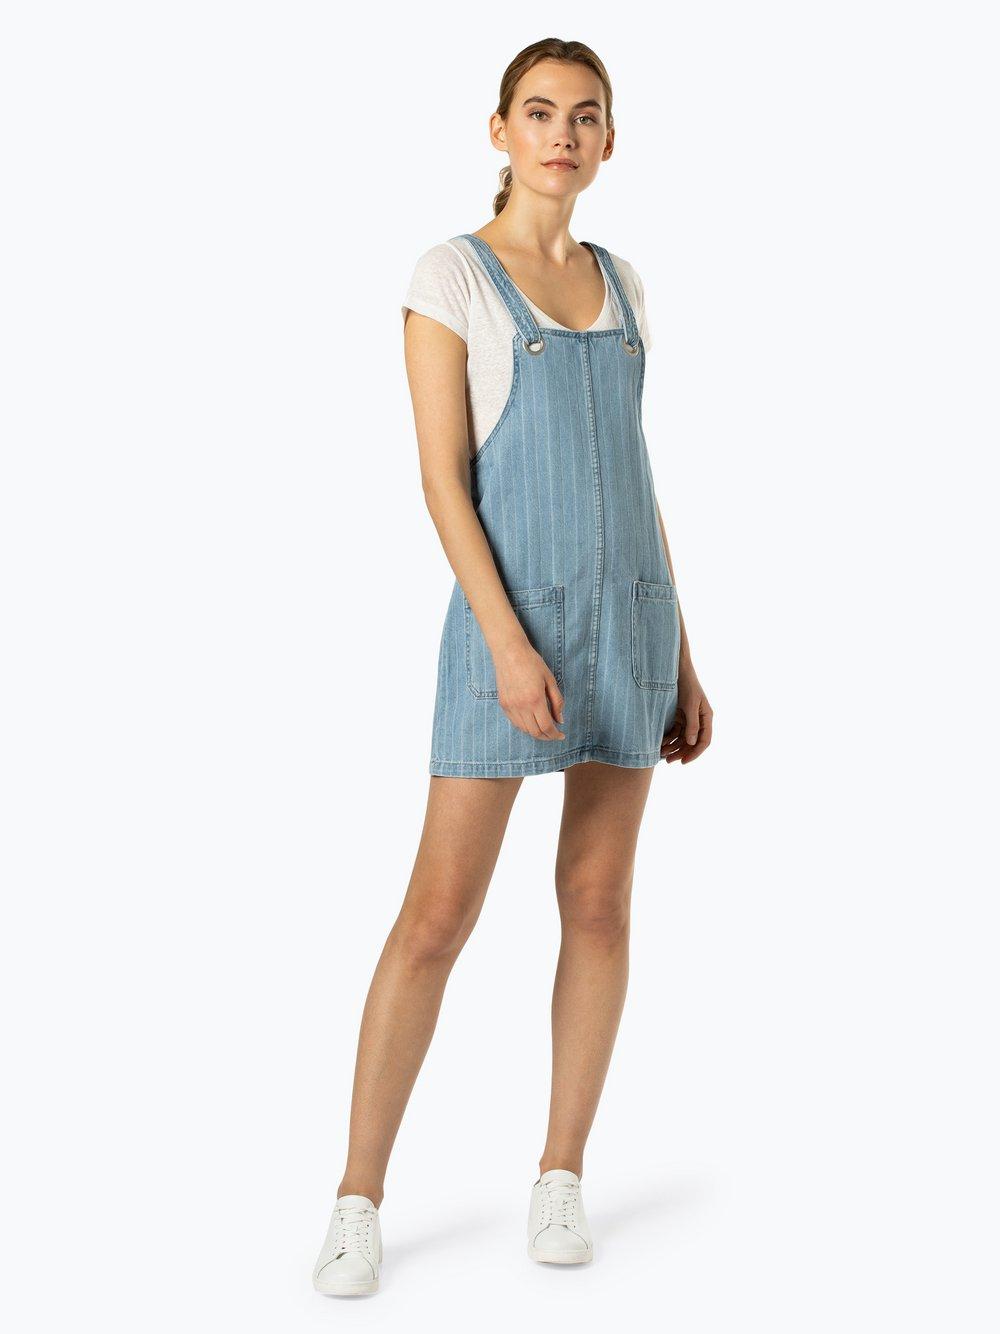 Review - Damska sukienka jeansowa, niebieski